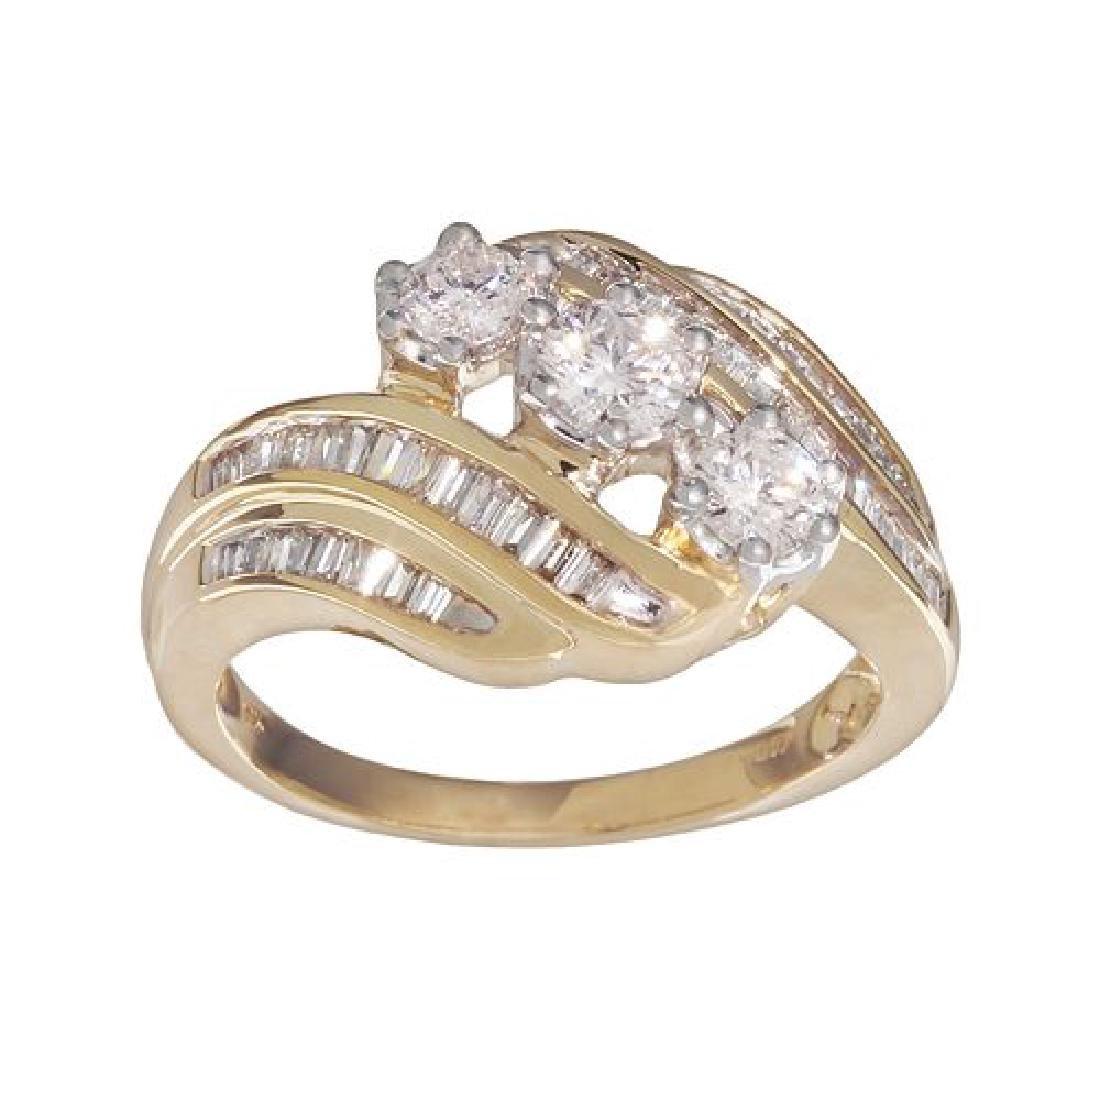 1 tcw, Diamond Cocktail Ring - 10k YG